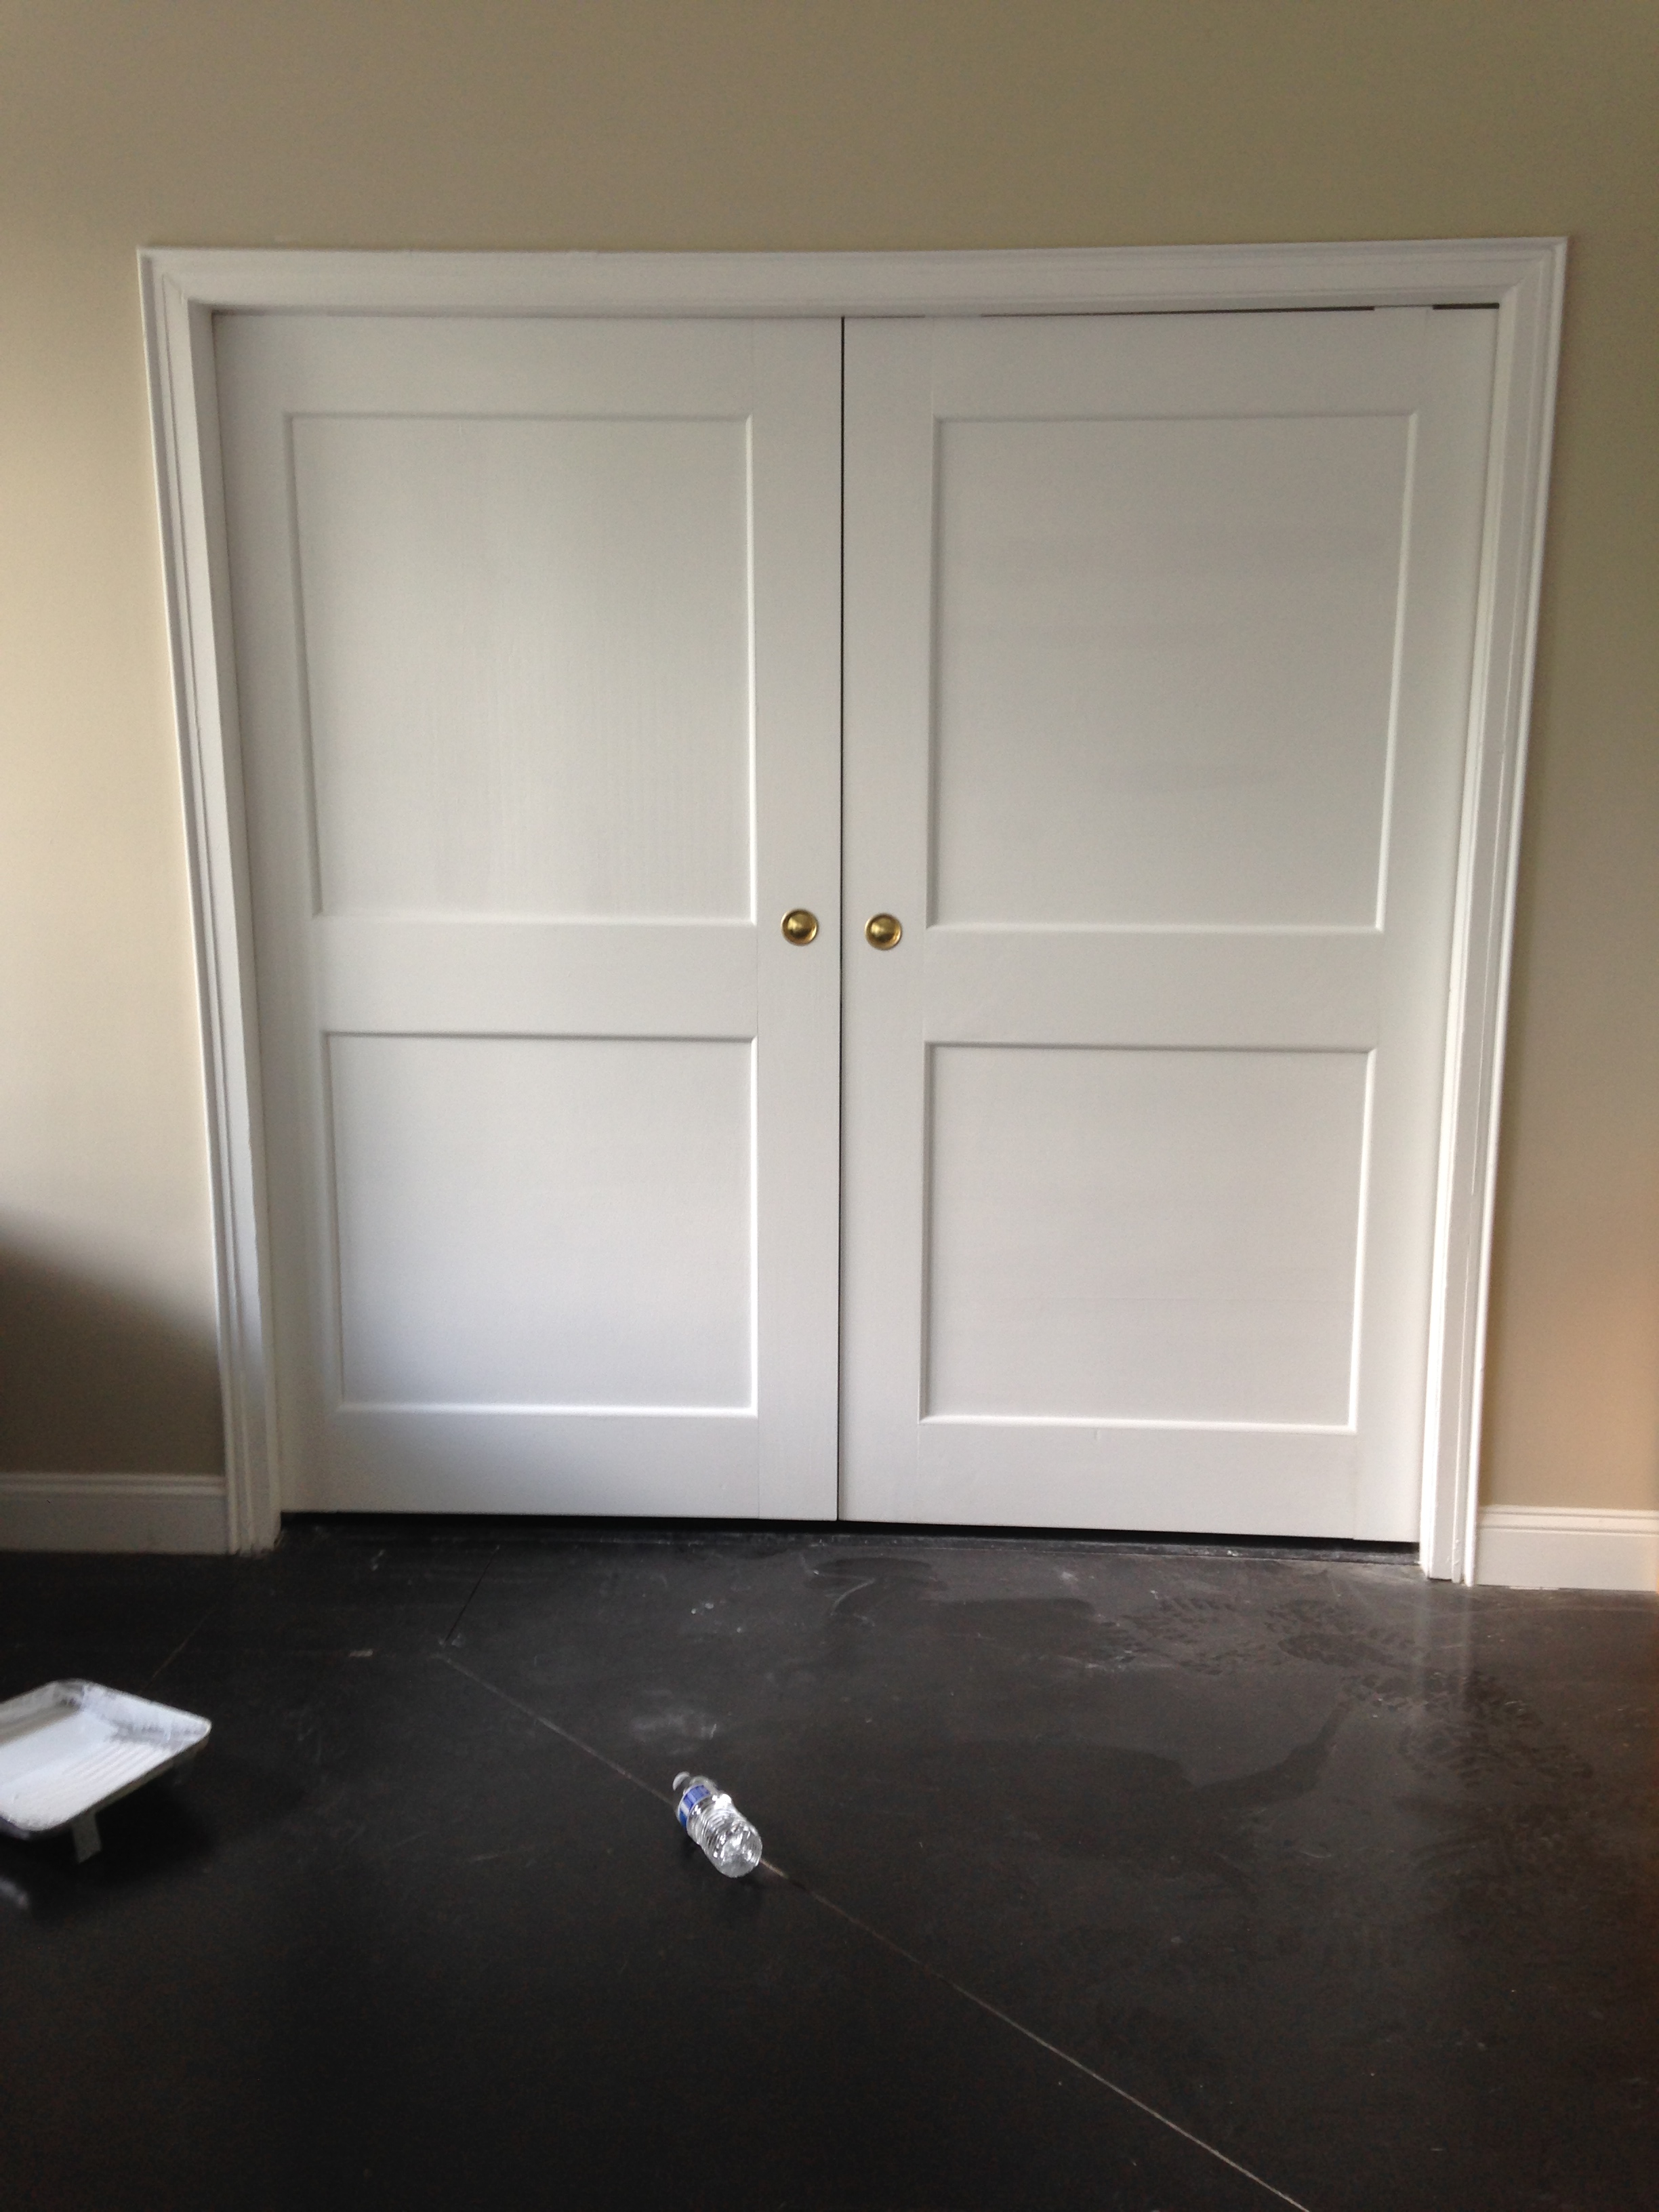 Closet doors post renovation